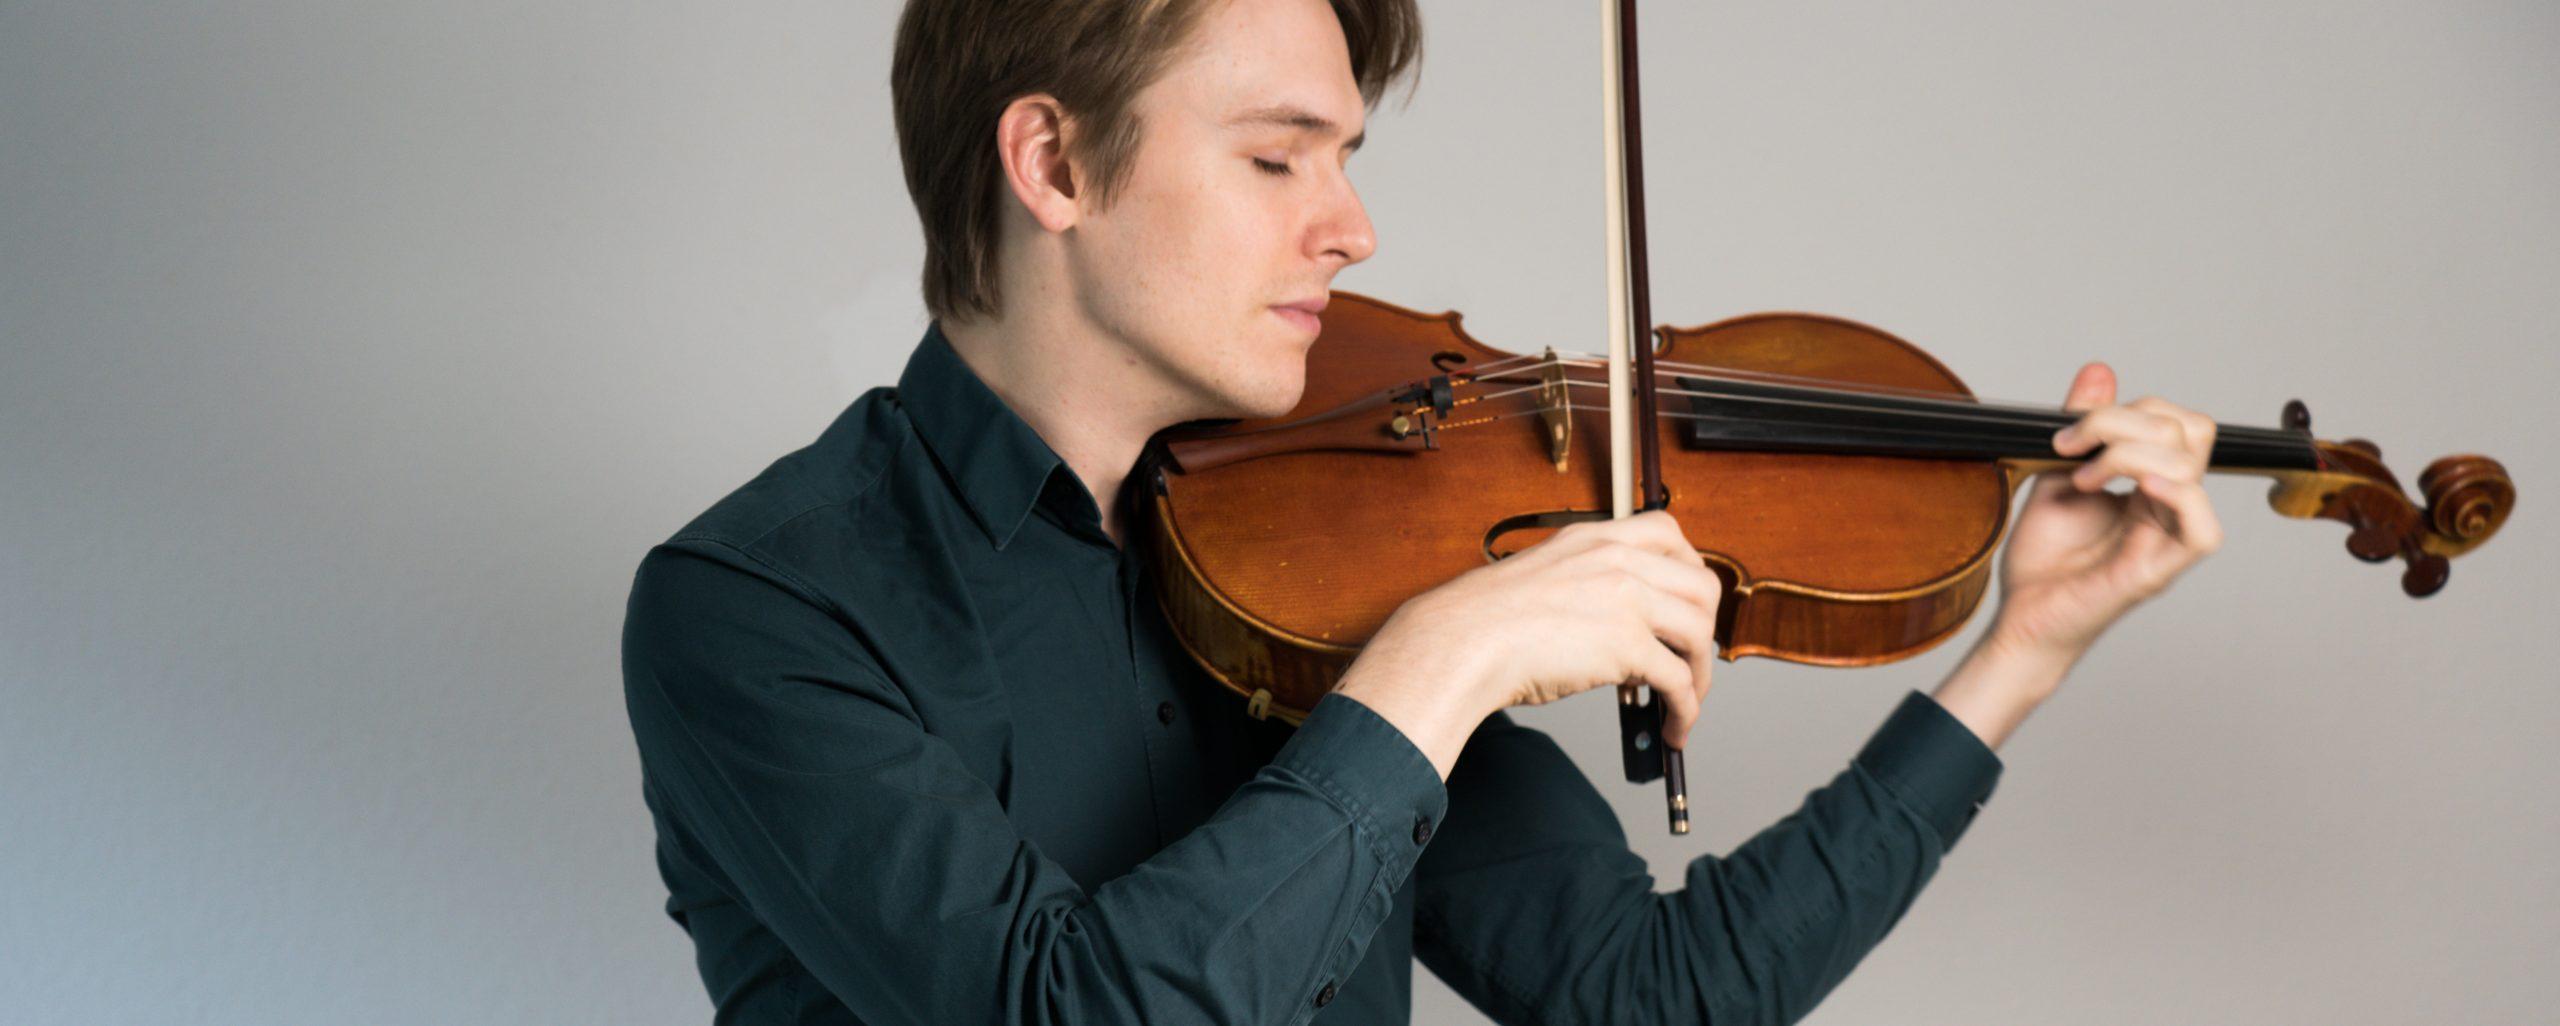 Violist, altiste, 中提琴, Benjamin Beck, 本杰明